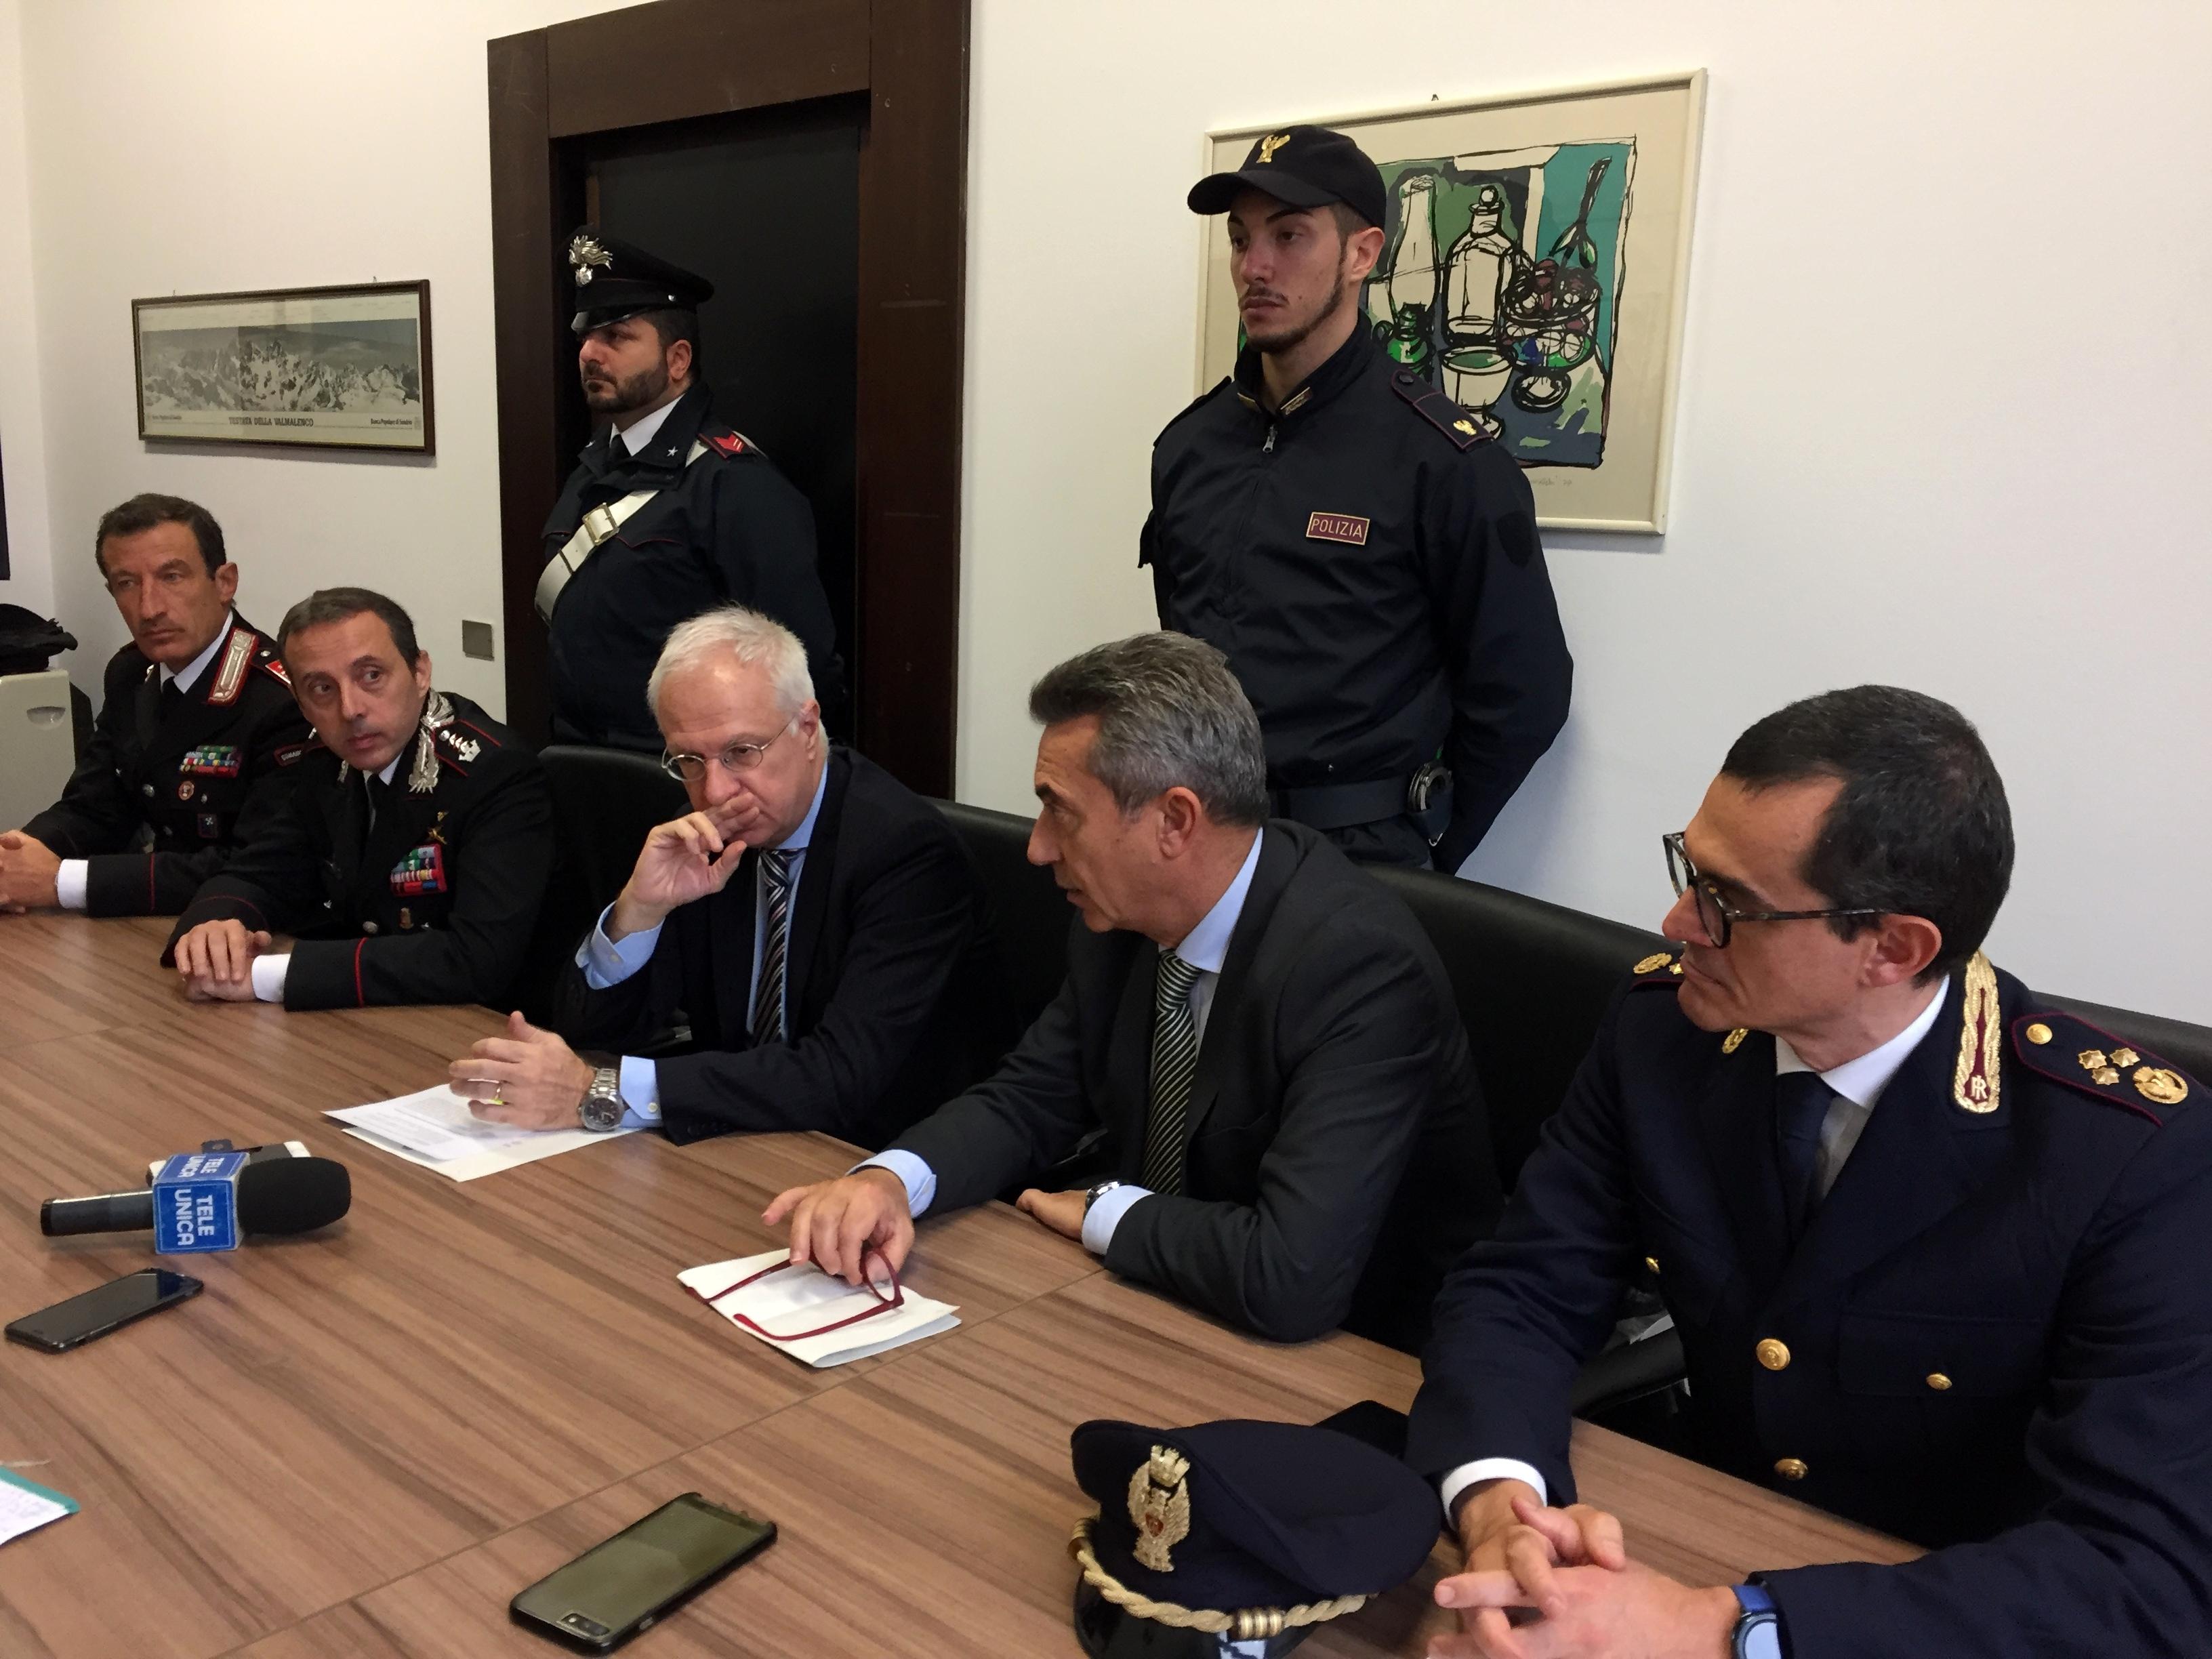 conferenza stampa ladri Villapinta-2